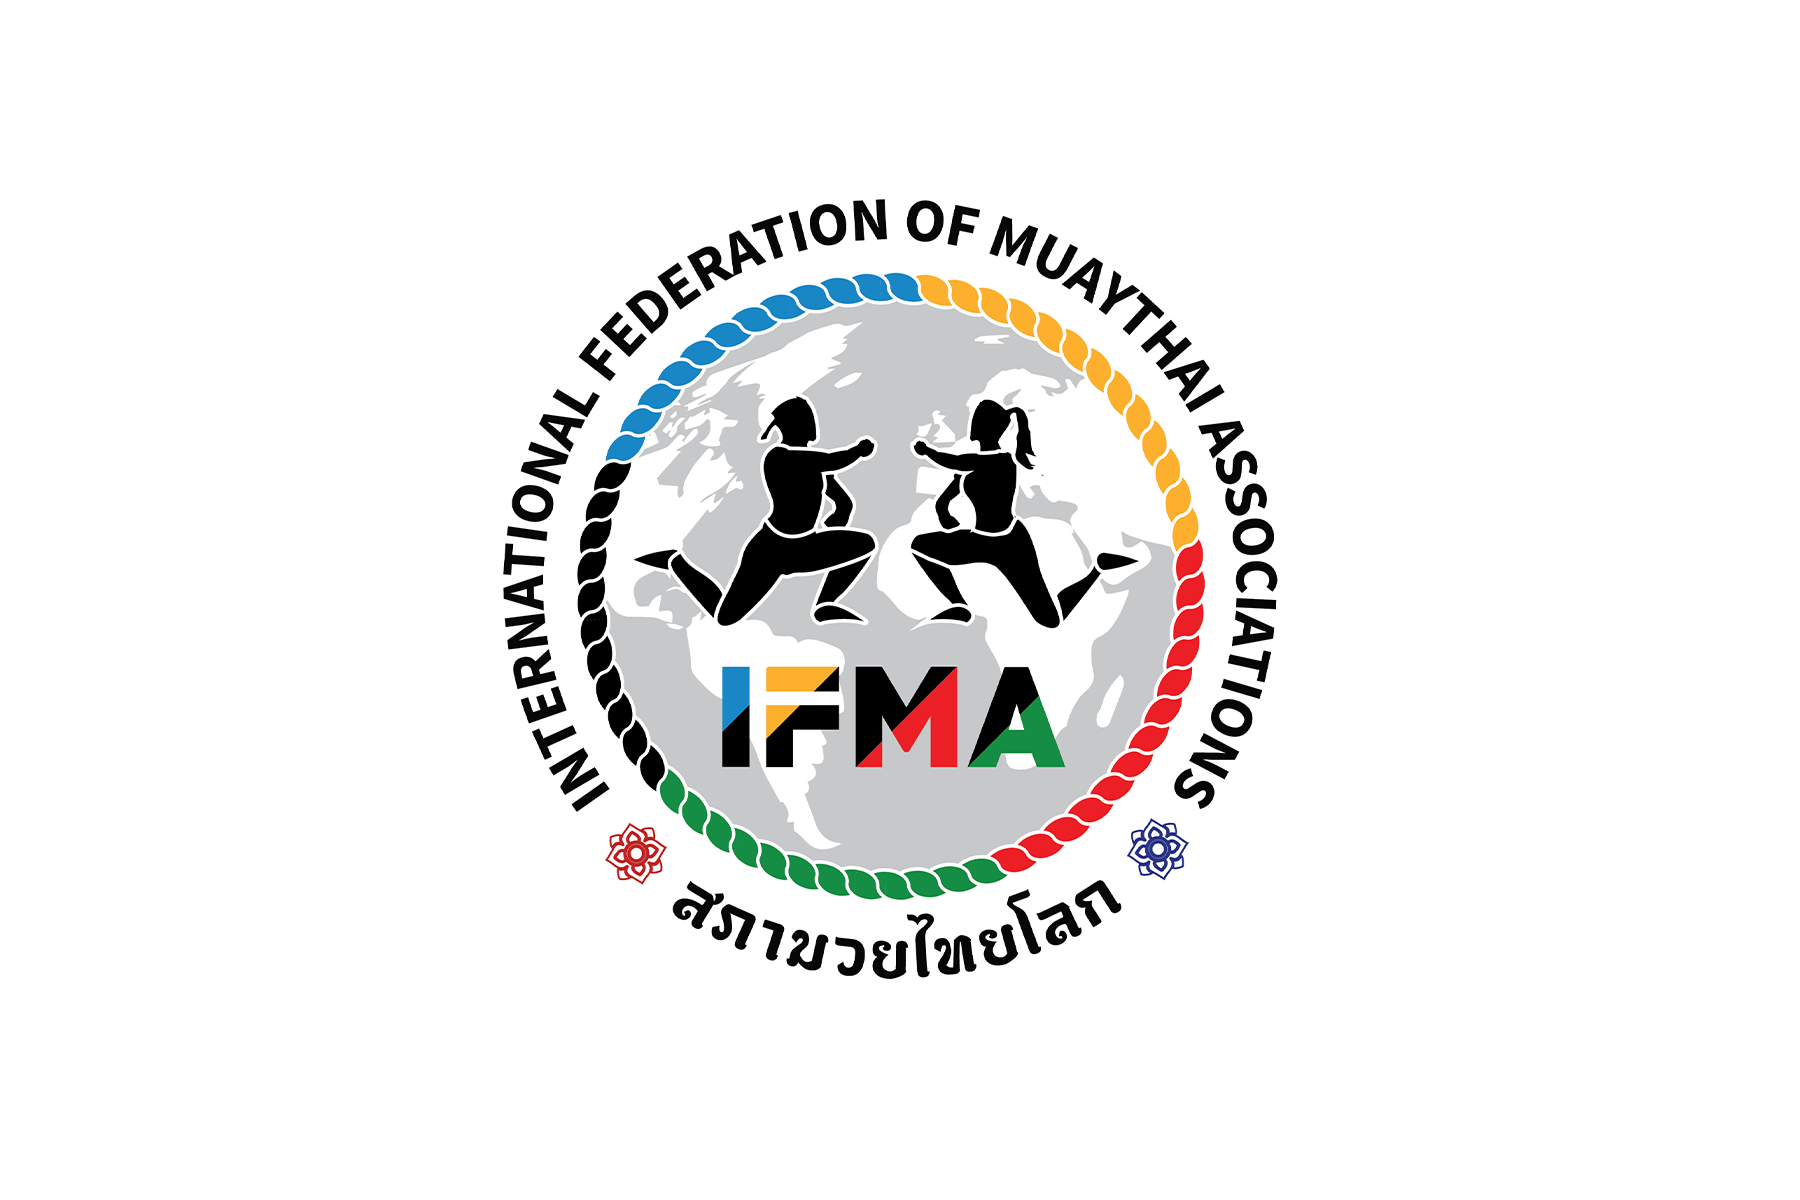 Morning Activity – Muaythai by IFMA